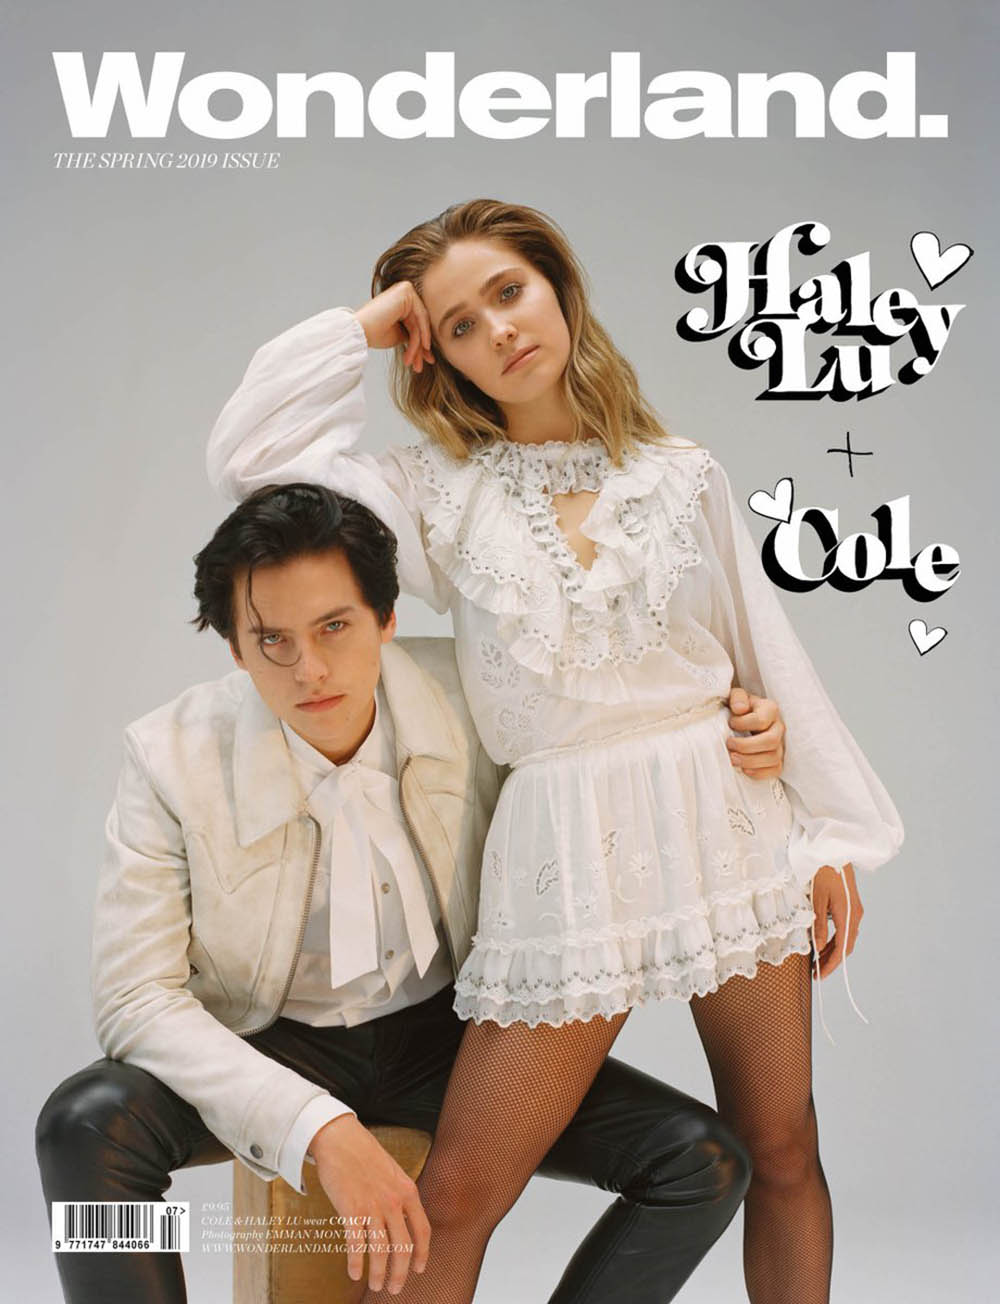 Cole Sprouse and Haley Lu Richardson cover Wonderland Magazine Spring 2019 by Emma Montalvan